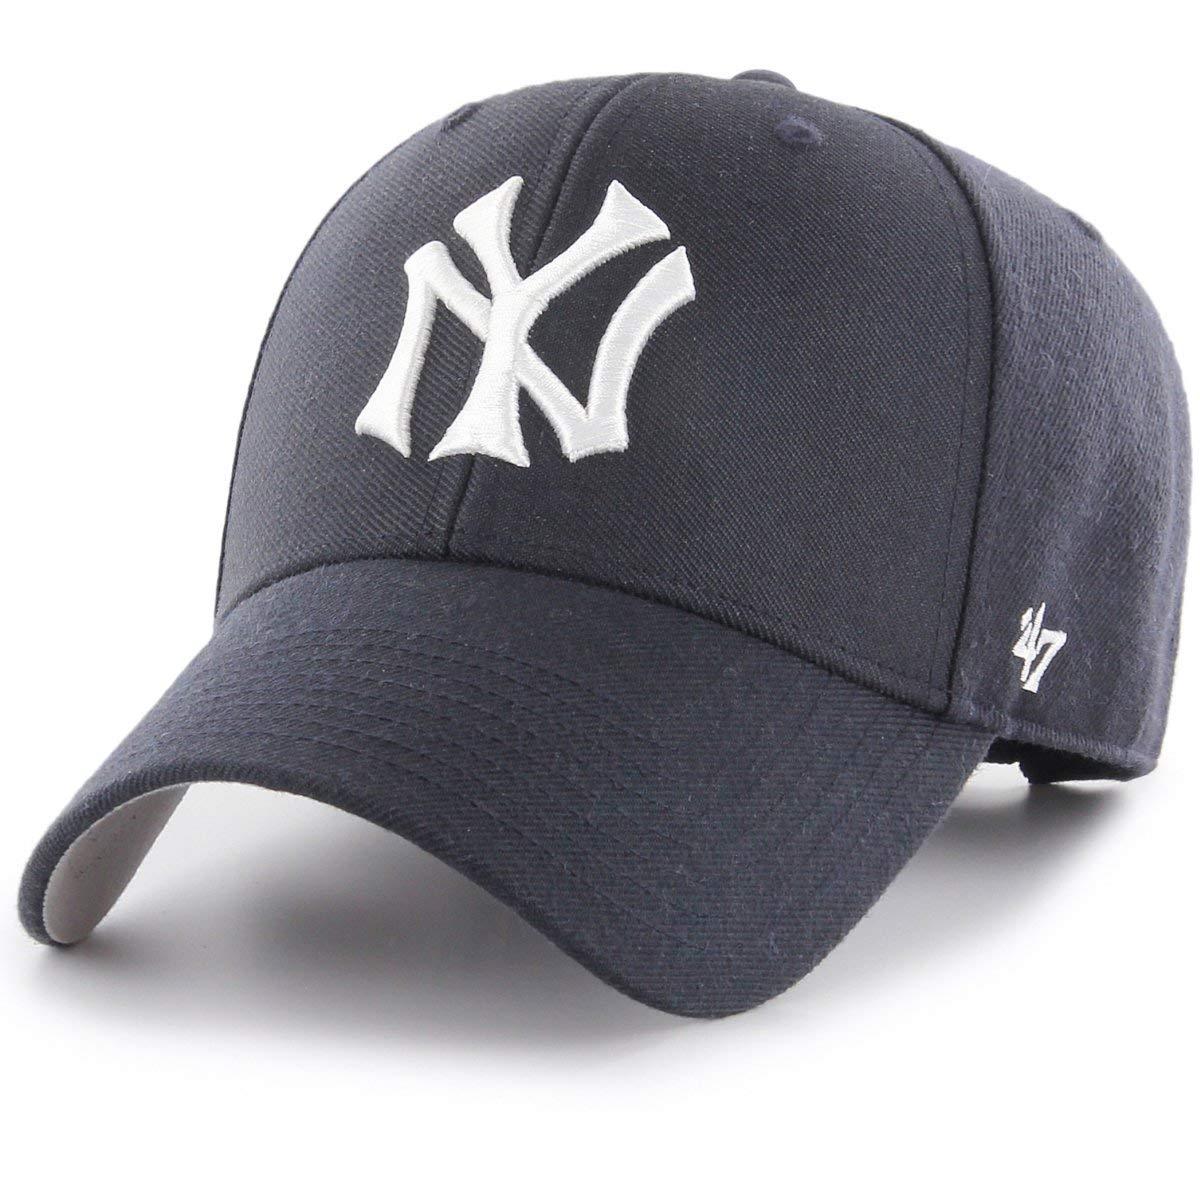 2ae9fe95722  47 Brand MLB New York Yankees MVP Cap - Navy  Amazon.co.uk  Clothing